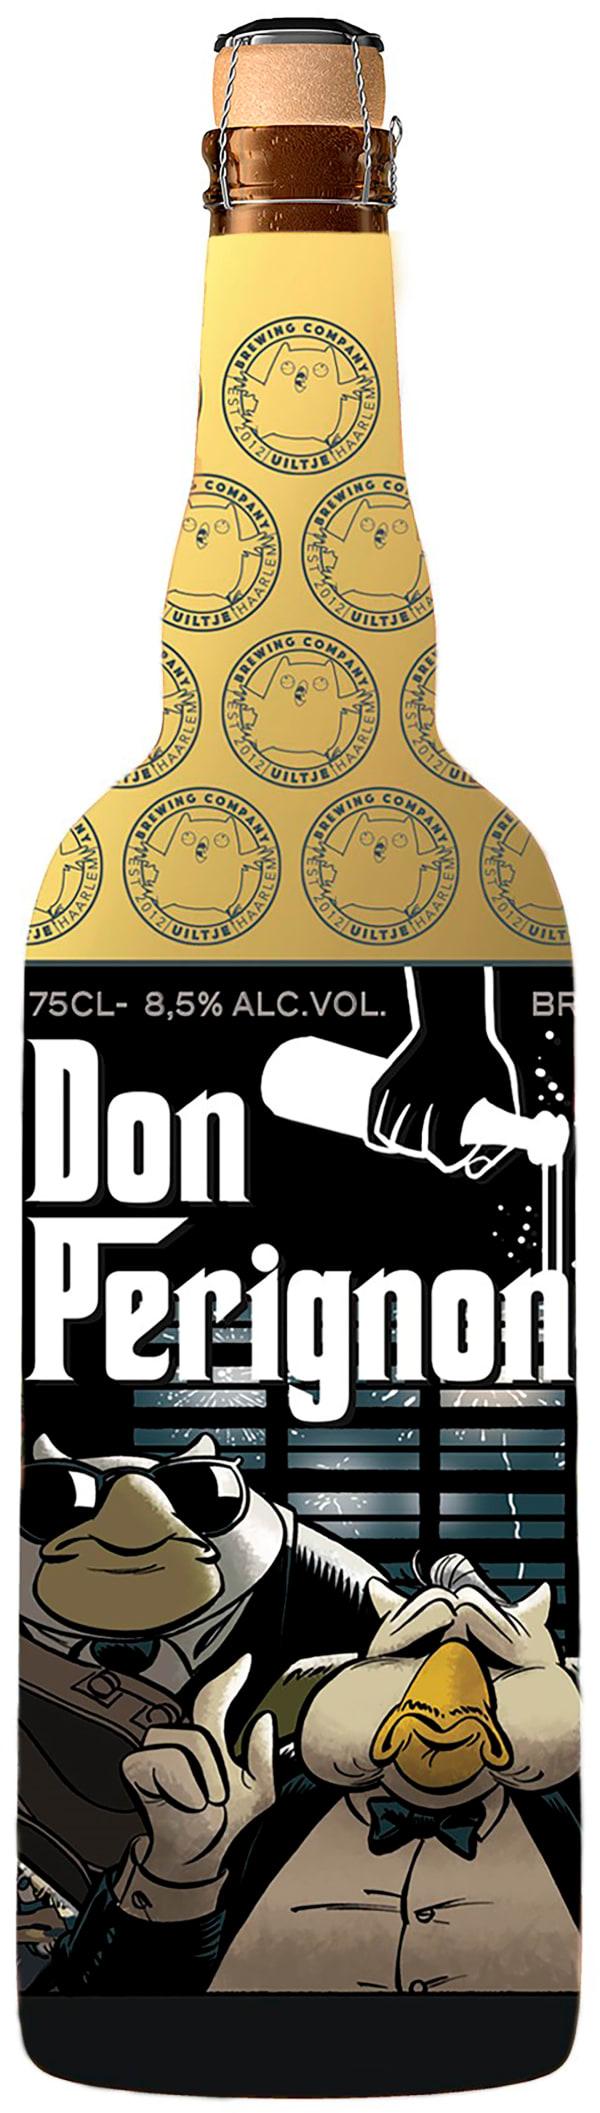 Uiltje Don Perignon Brut IPA